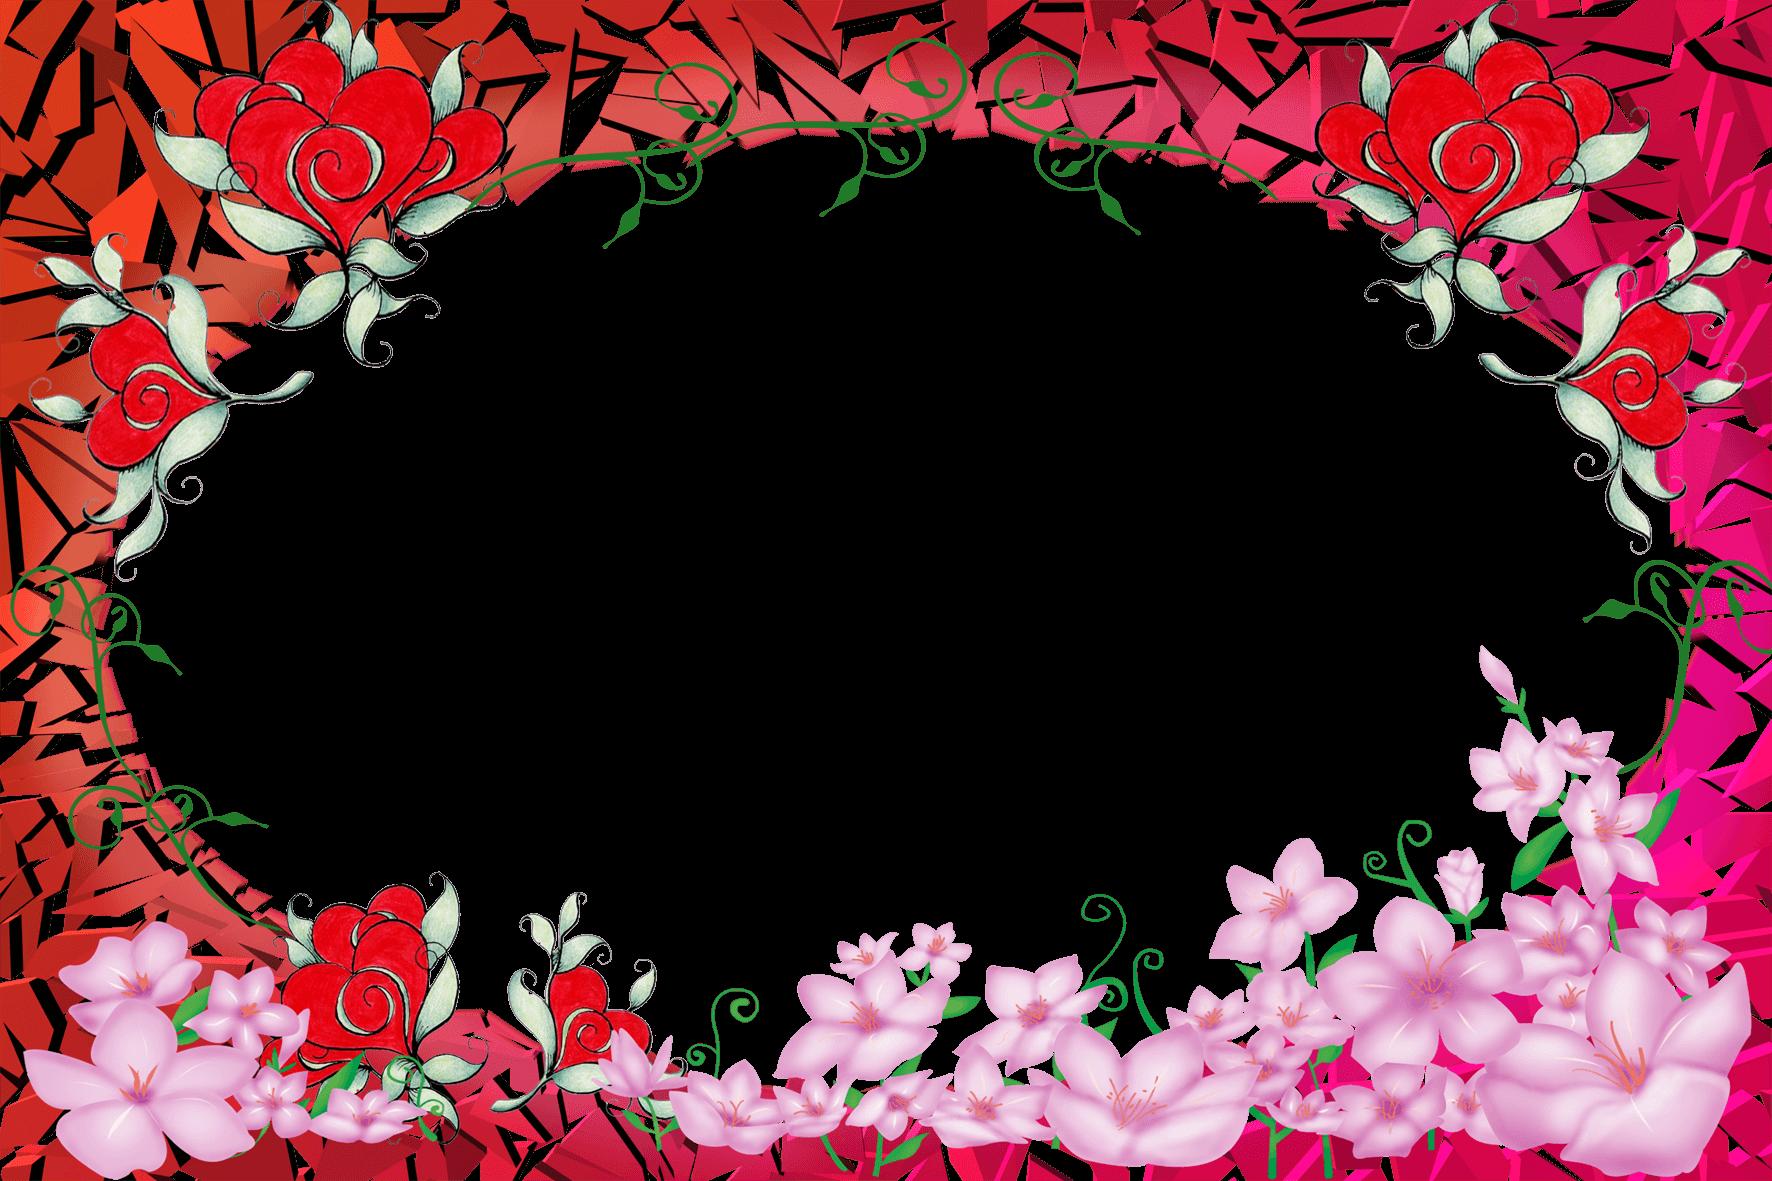 Marco Romántico Circular con Flores Rojas | Descargar Marcos